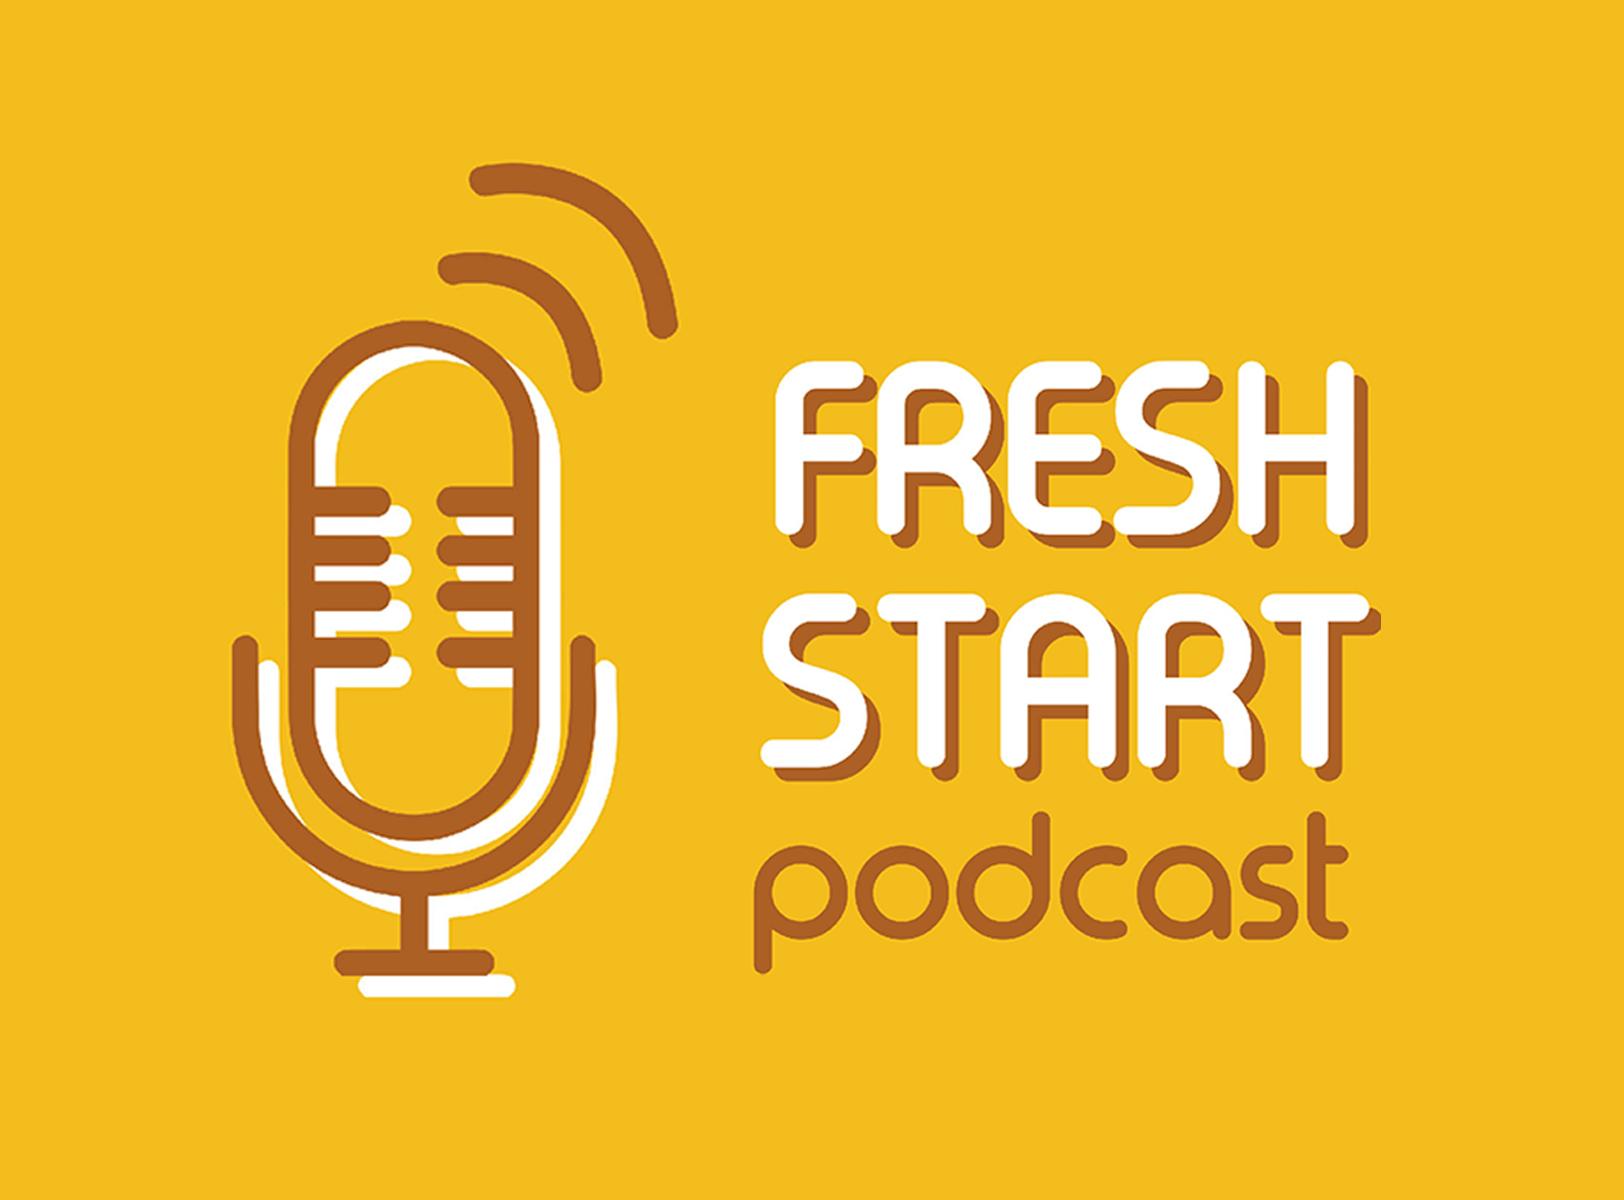 Fresh Start: Podcast News (2/26/2020 Wed.)